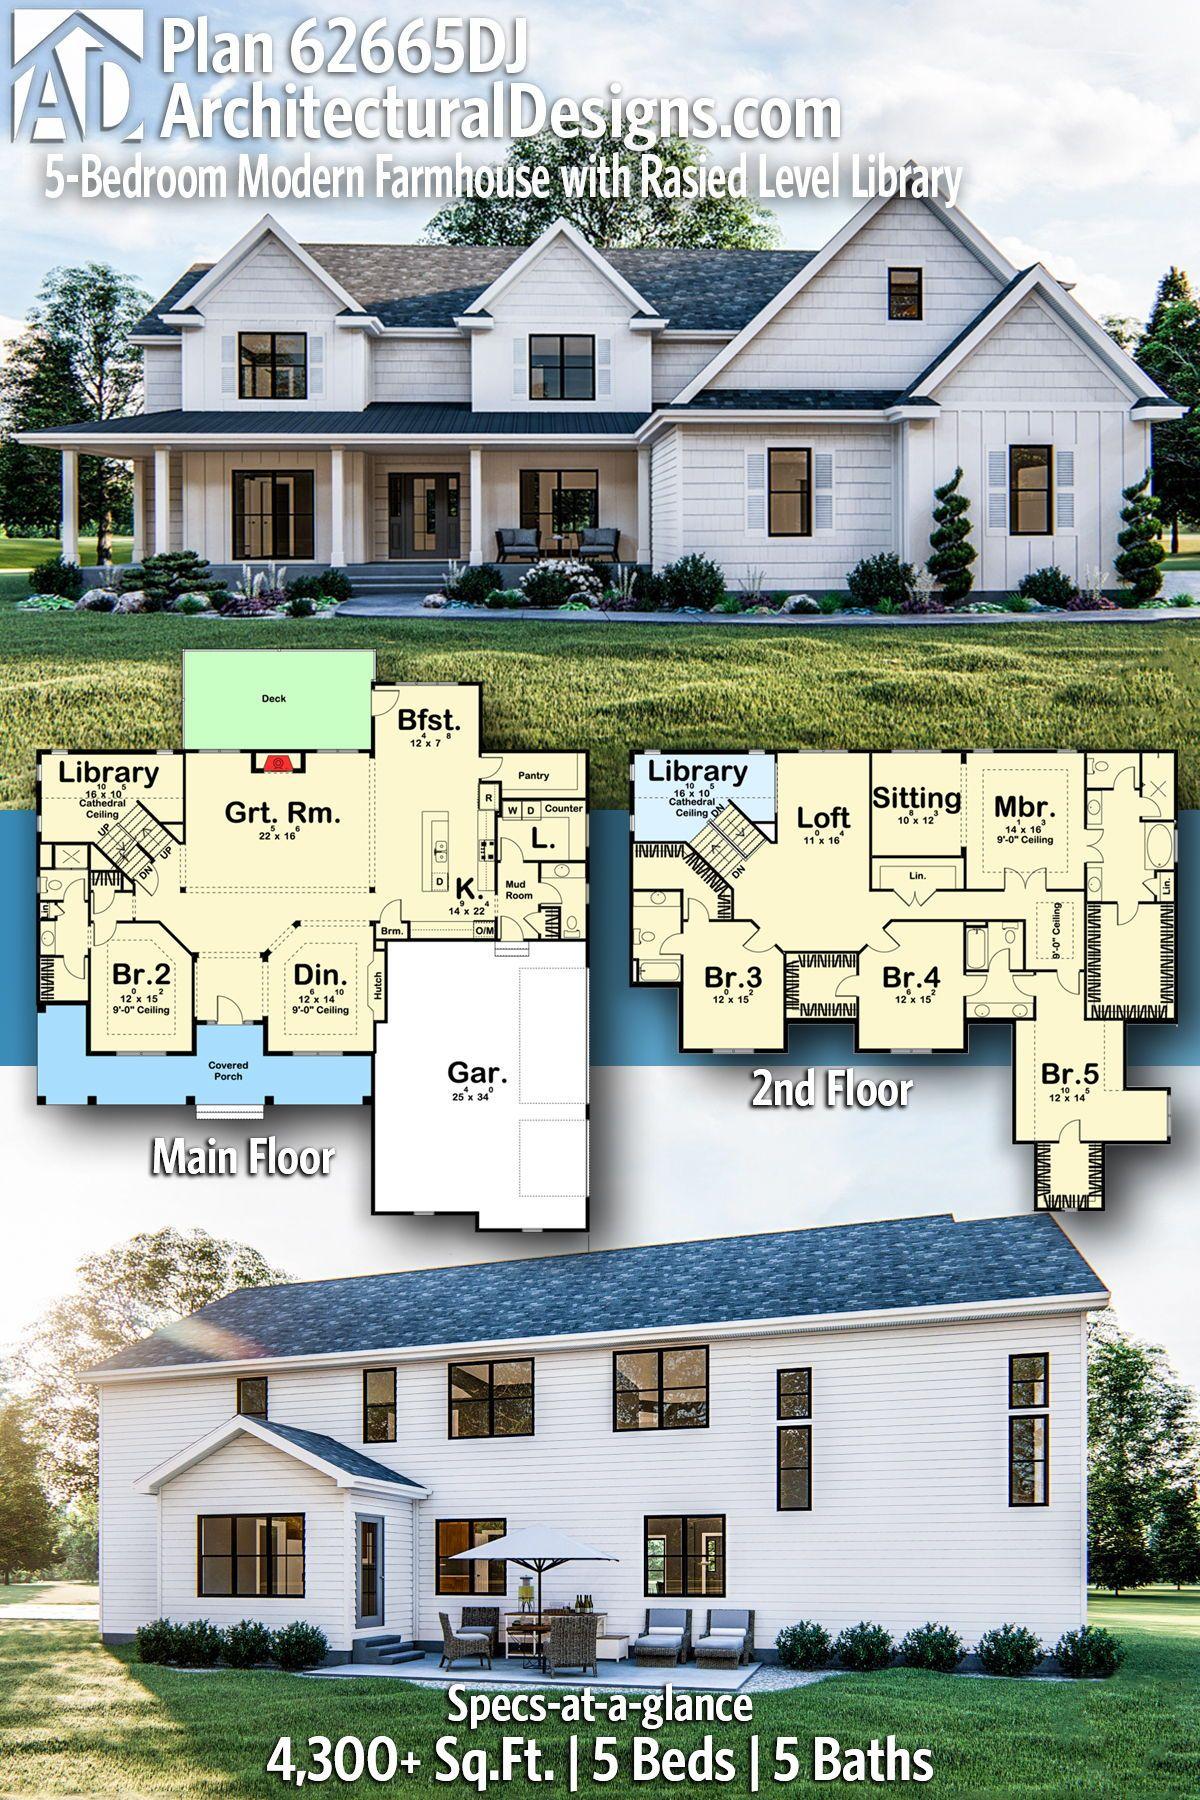 Plan 62665dj 5 Bedroom Modern Farmhouse Plan En 2020 Planos De Casas Grandes Planos De Casas Casas Grandes